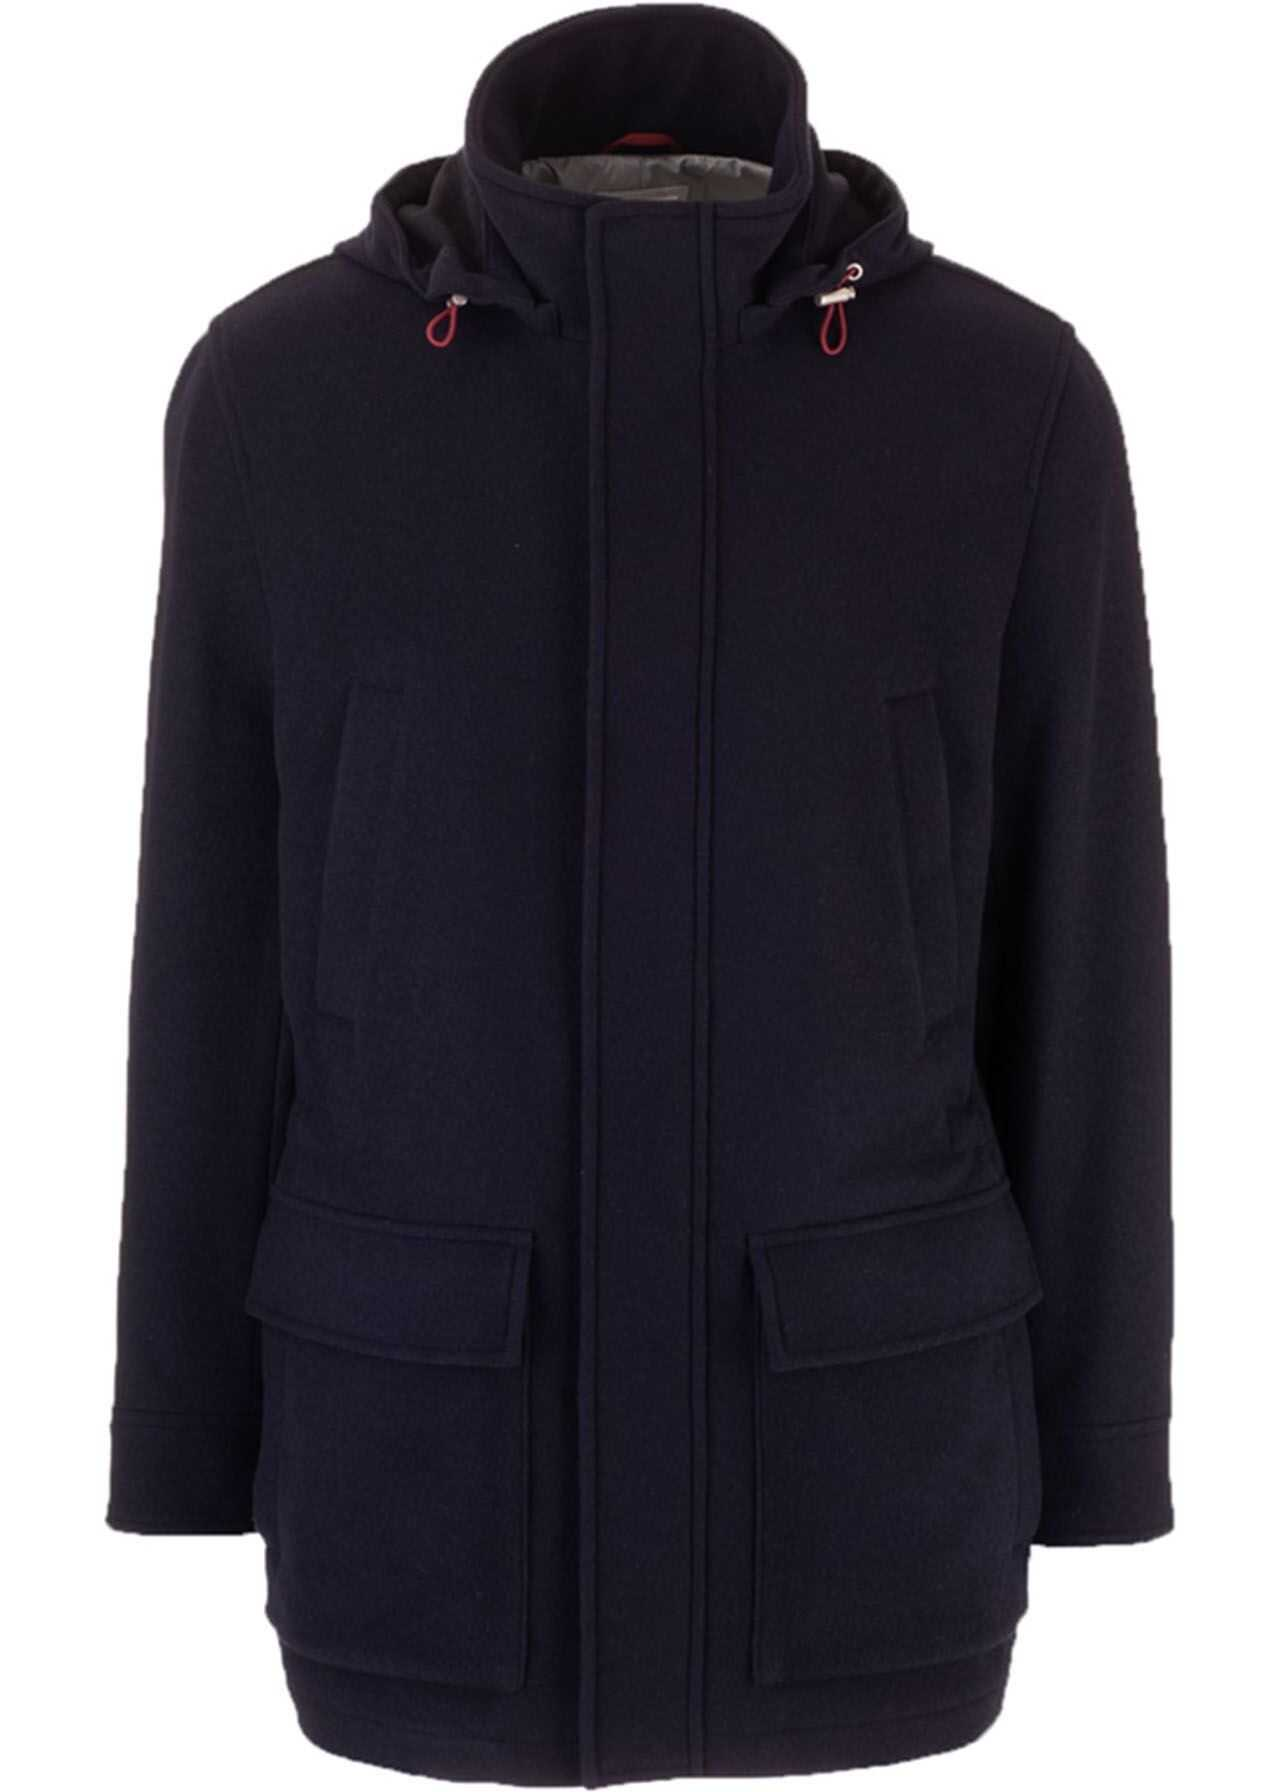 Brunello Cucinelli Cashmere Tight Jacket In Blue Blue imagine